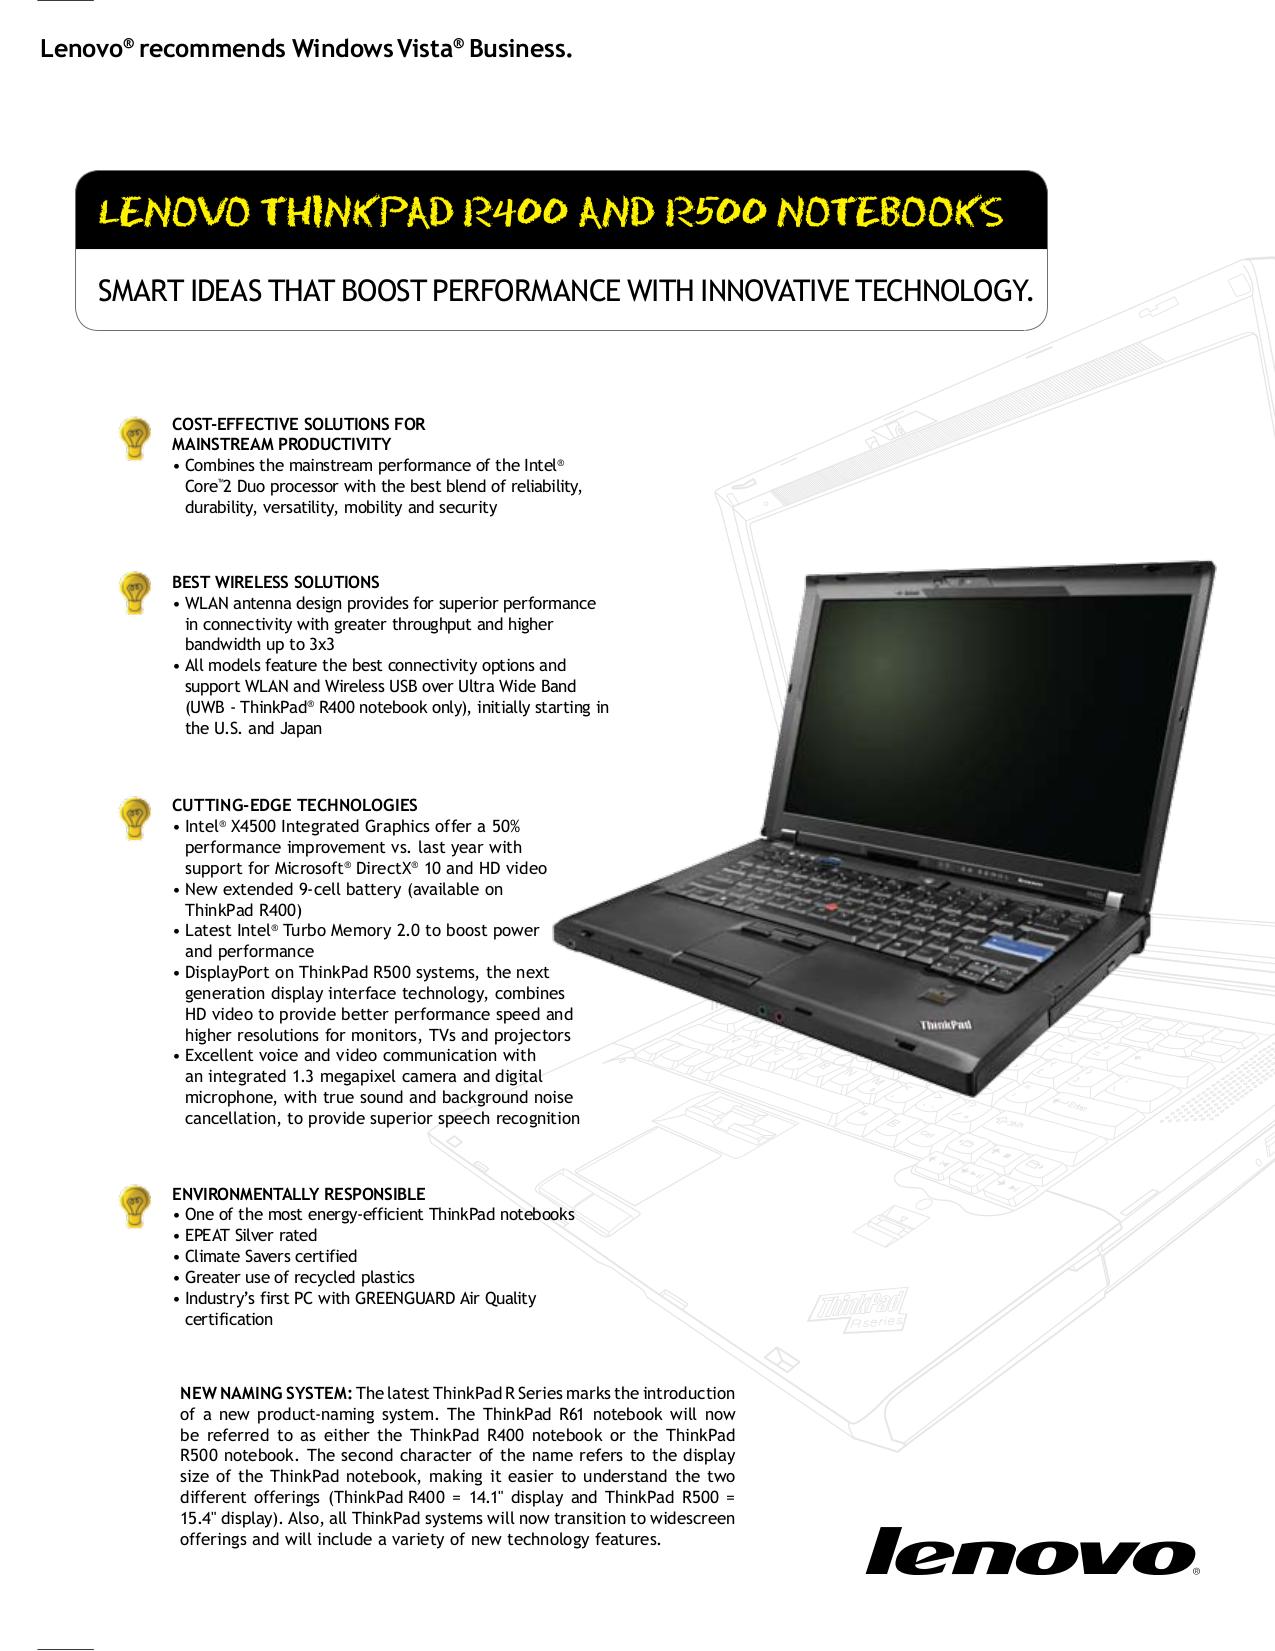 download free pdf for lenovo thinkpad r400 7440 laptop manual rh umlib com lenovo r400 user manual lenovo r400 user manual pdf